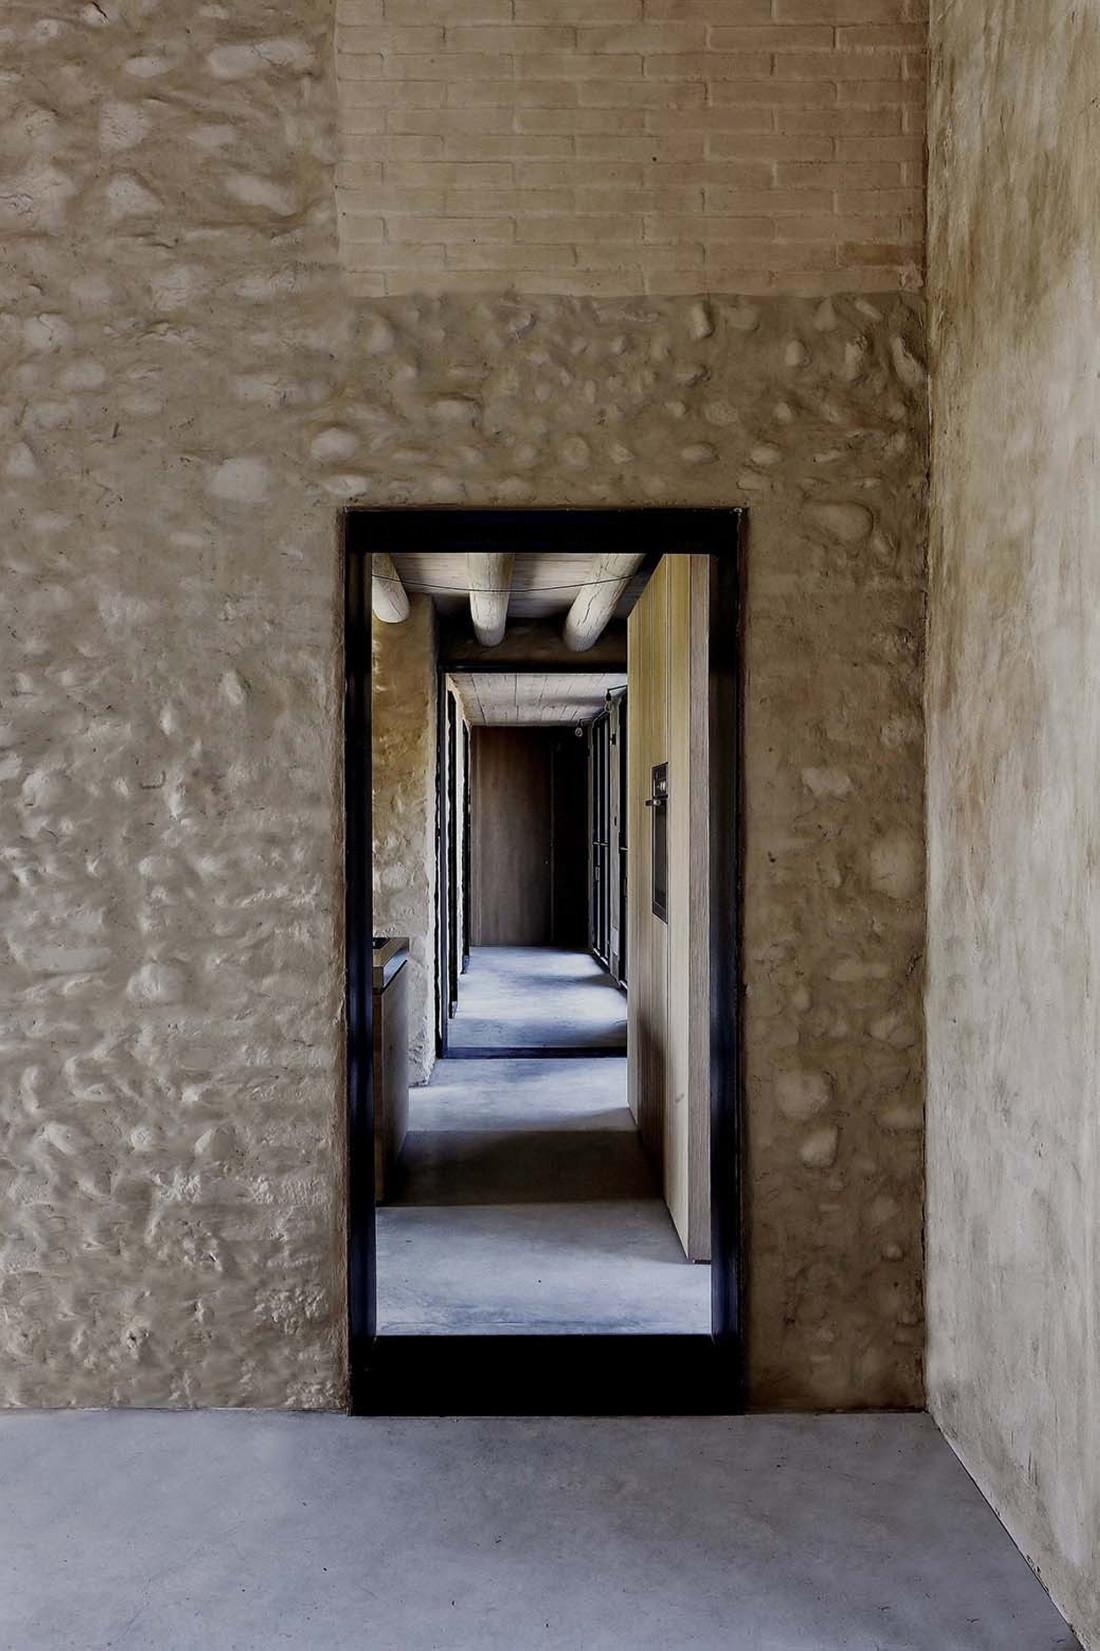 Реставрация виллы Brolo Saccomani в Италии от студии Bricolo Falsarella 13